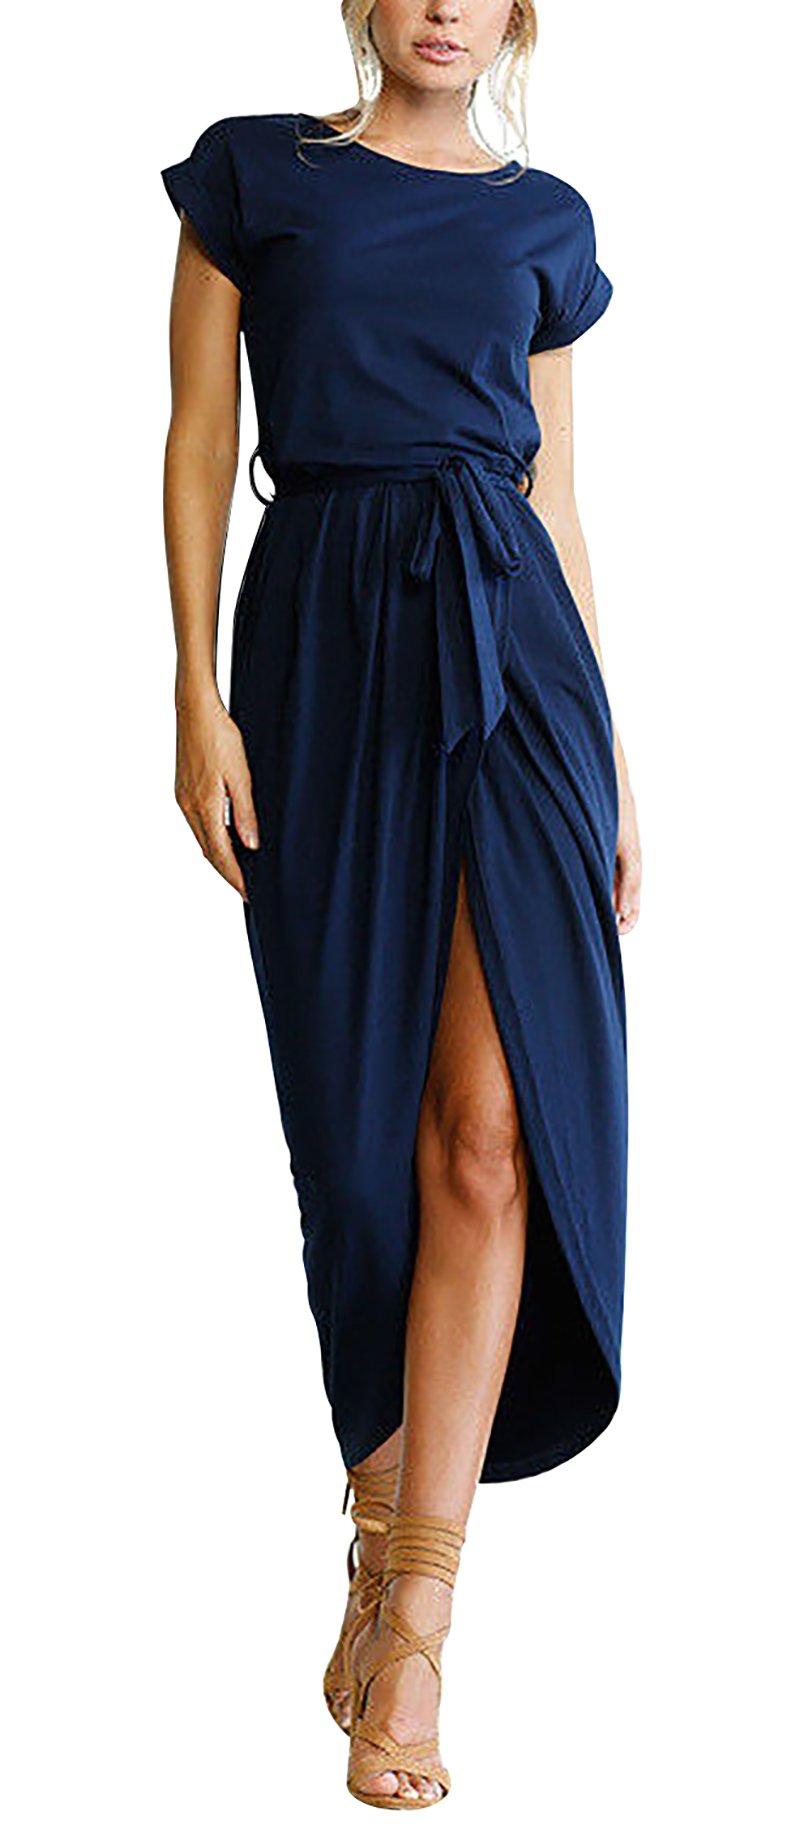 Yidarton Women Ladies Sexy Casual Short Sleeve Beach Party Slit Long Maxi Dress Navy M